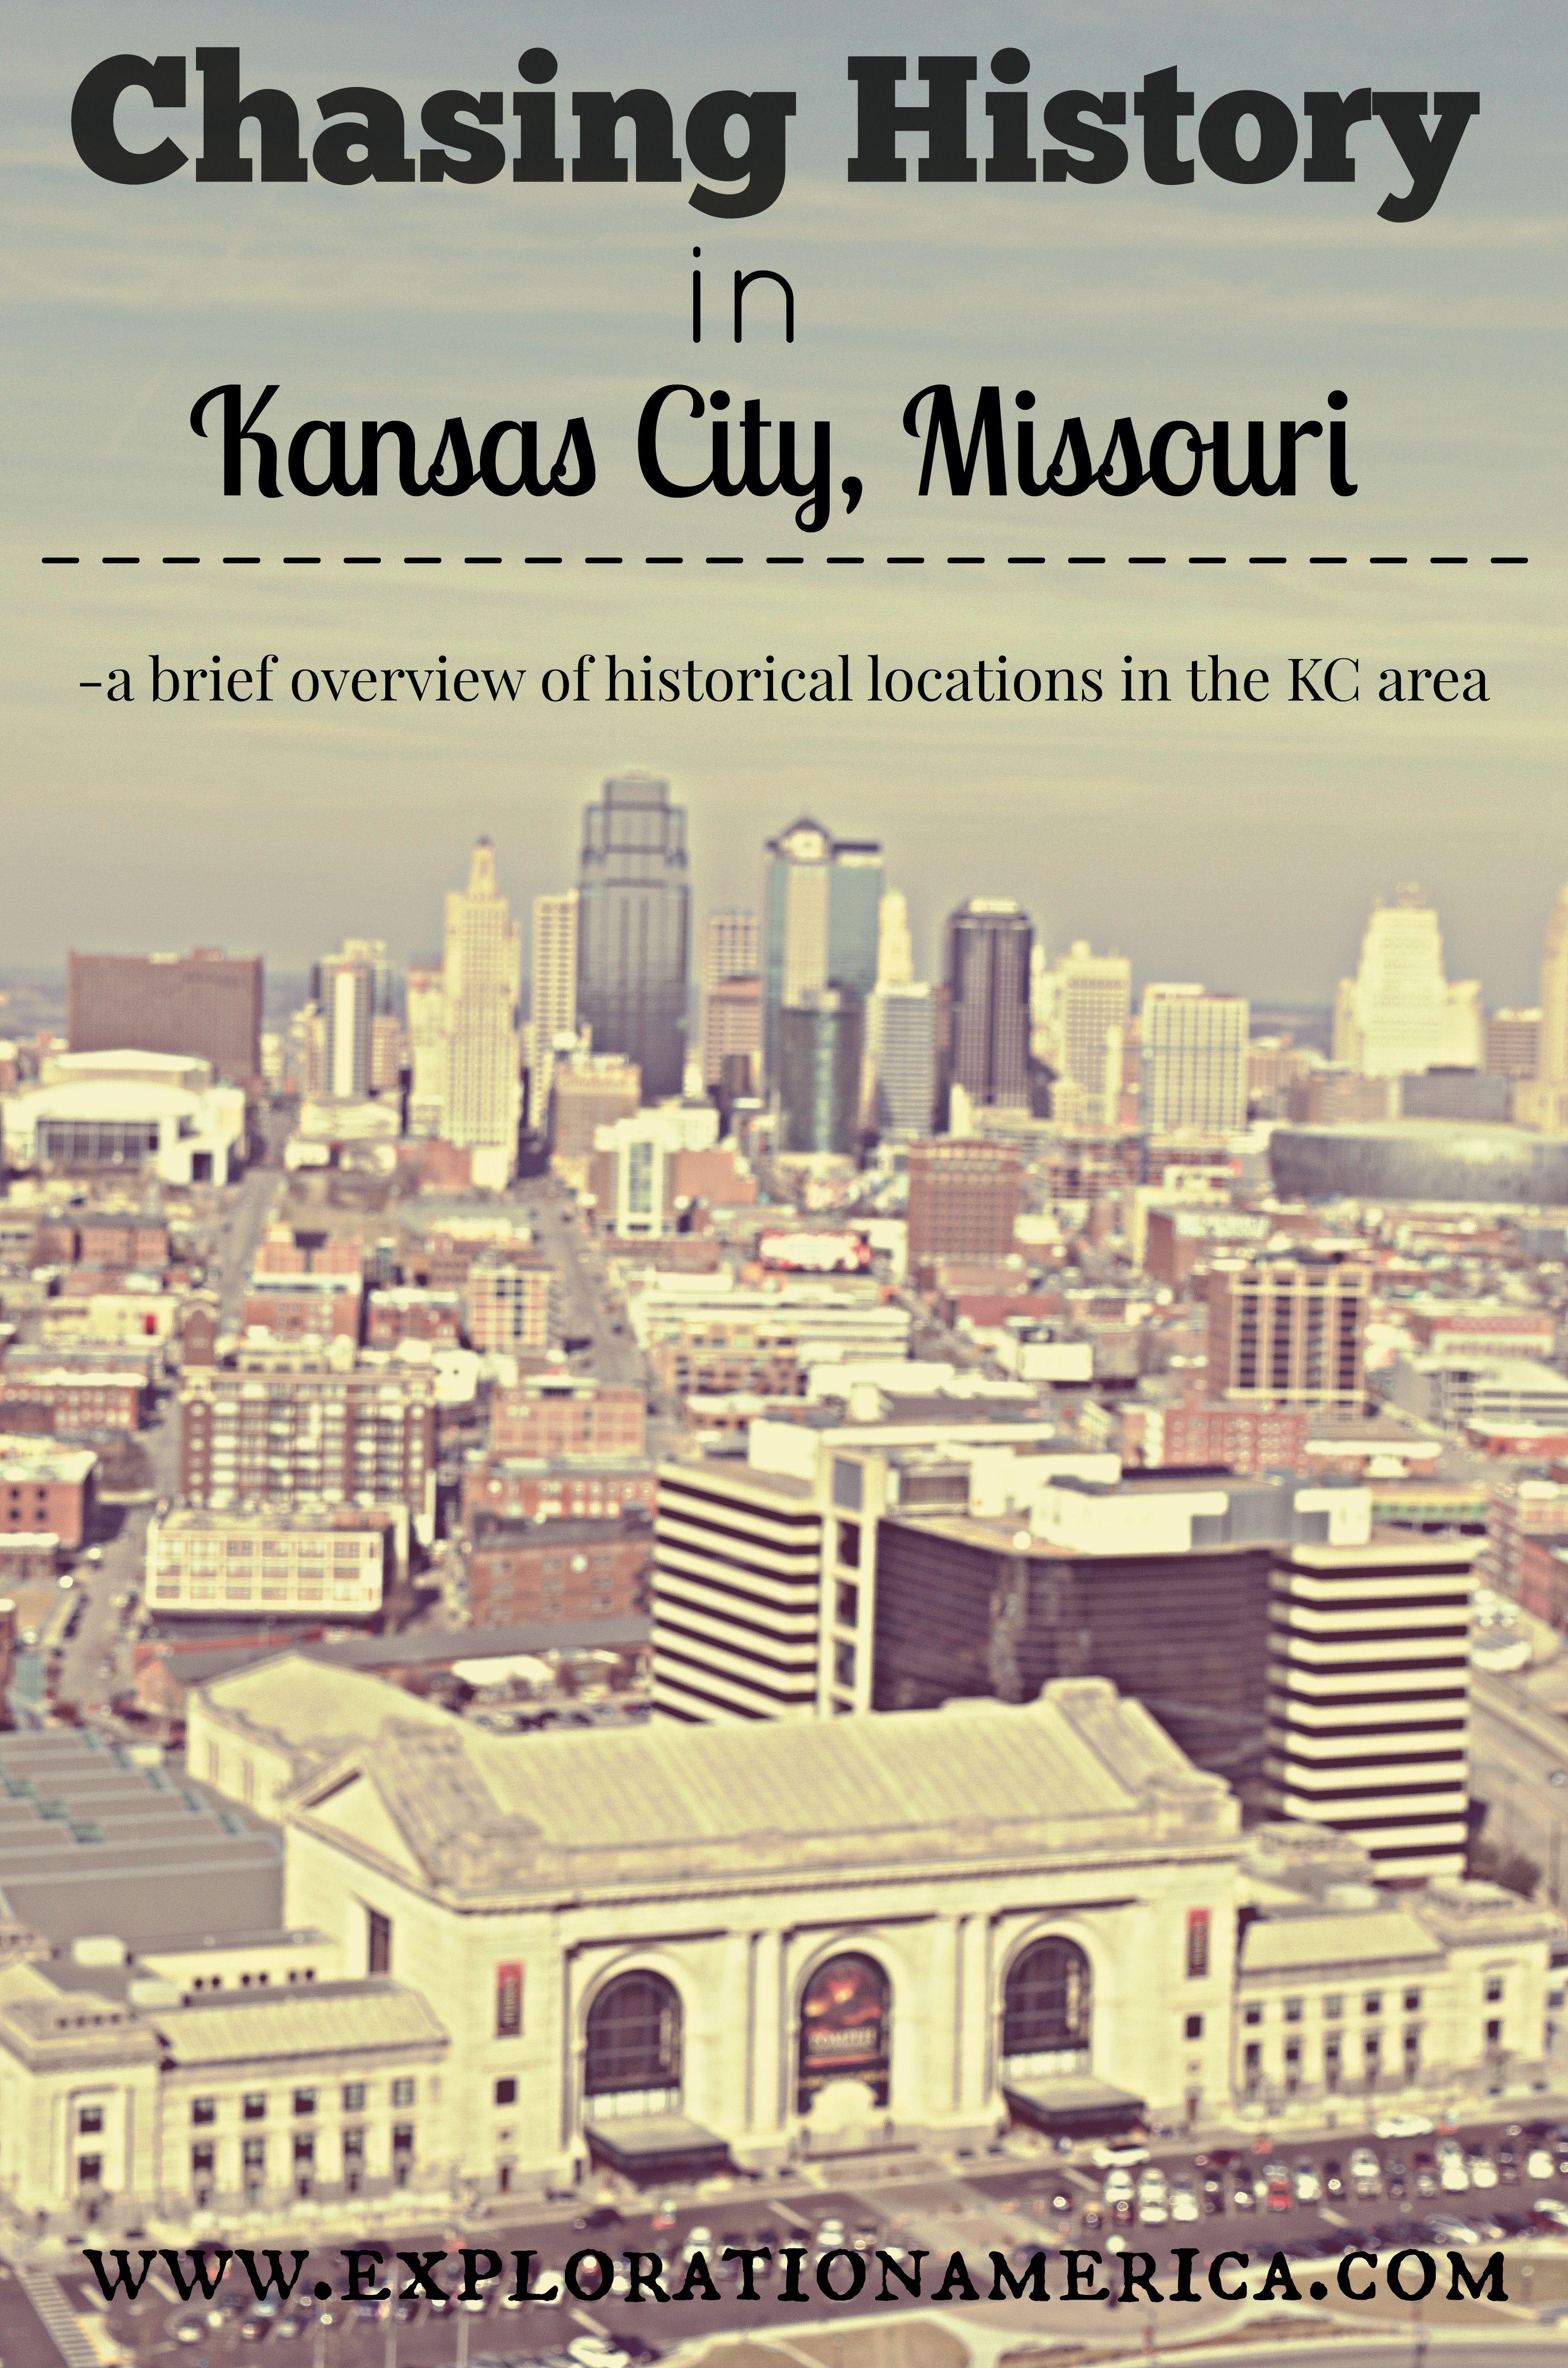 c4301a7ebabb86fc54118ad4ae95f4f2 - How To Get A Passport In Kansas City Missouri